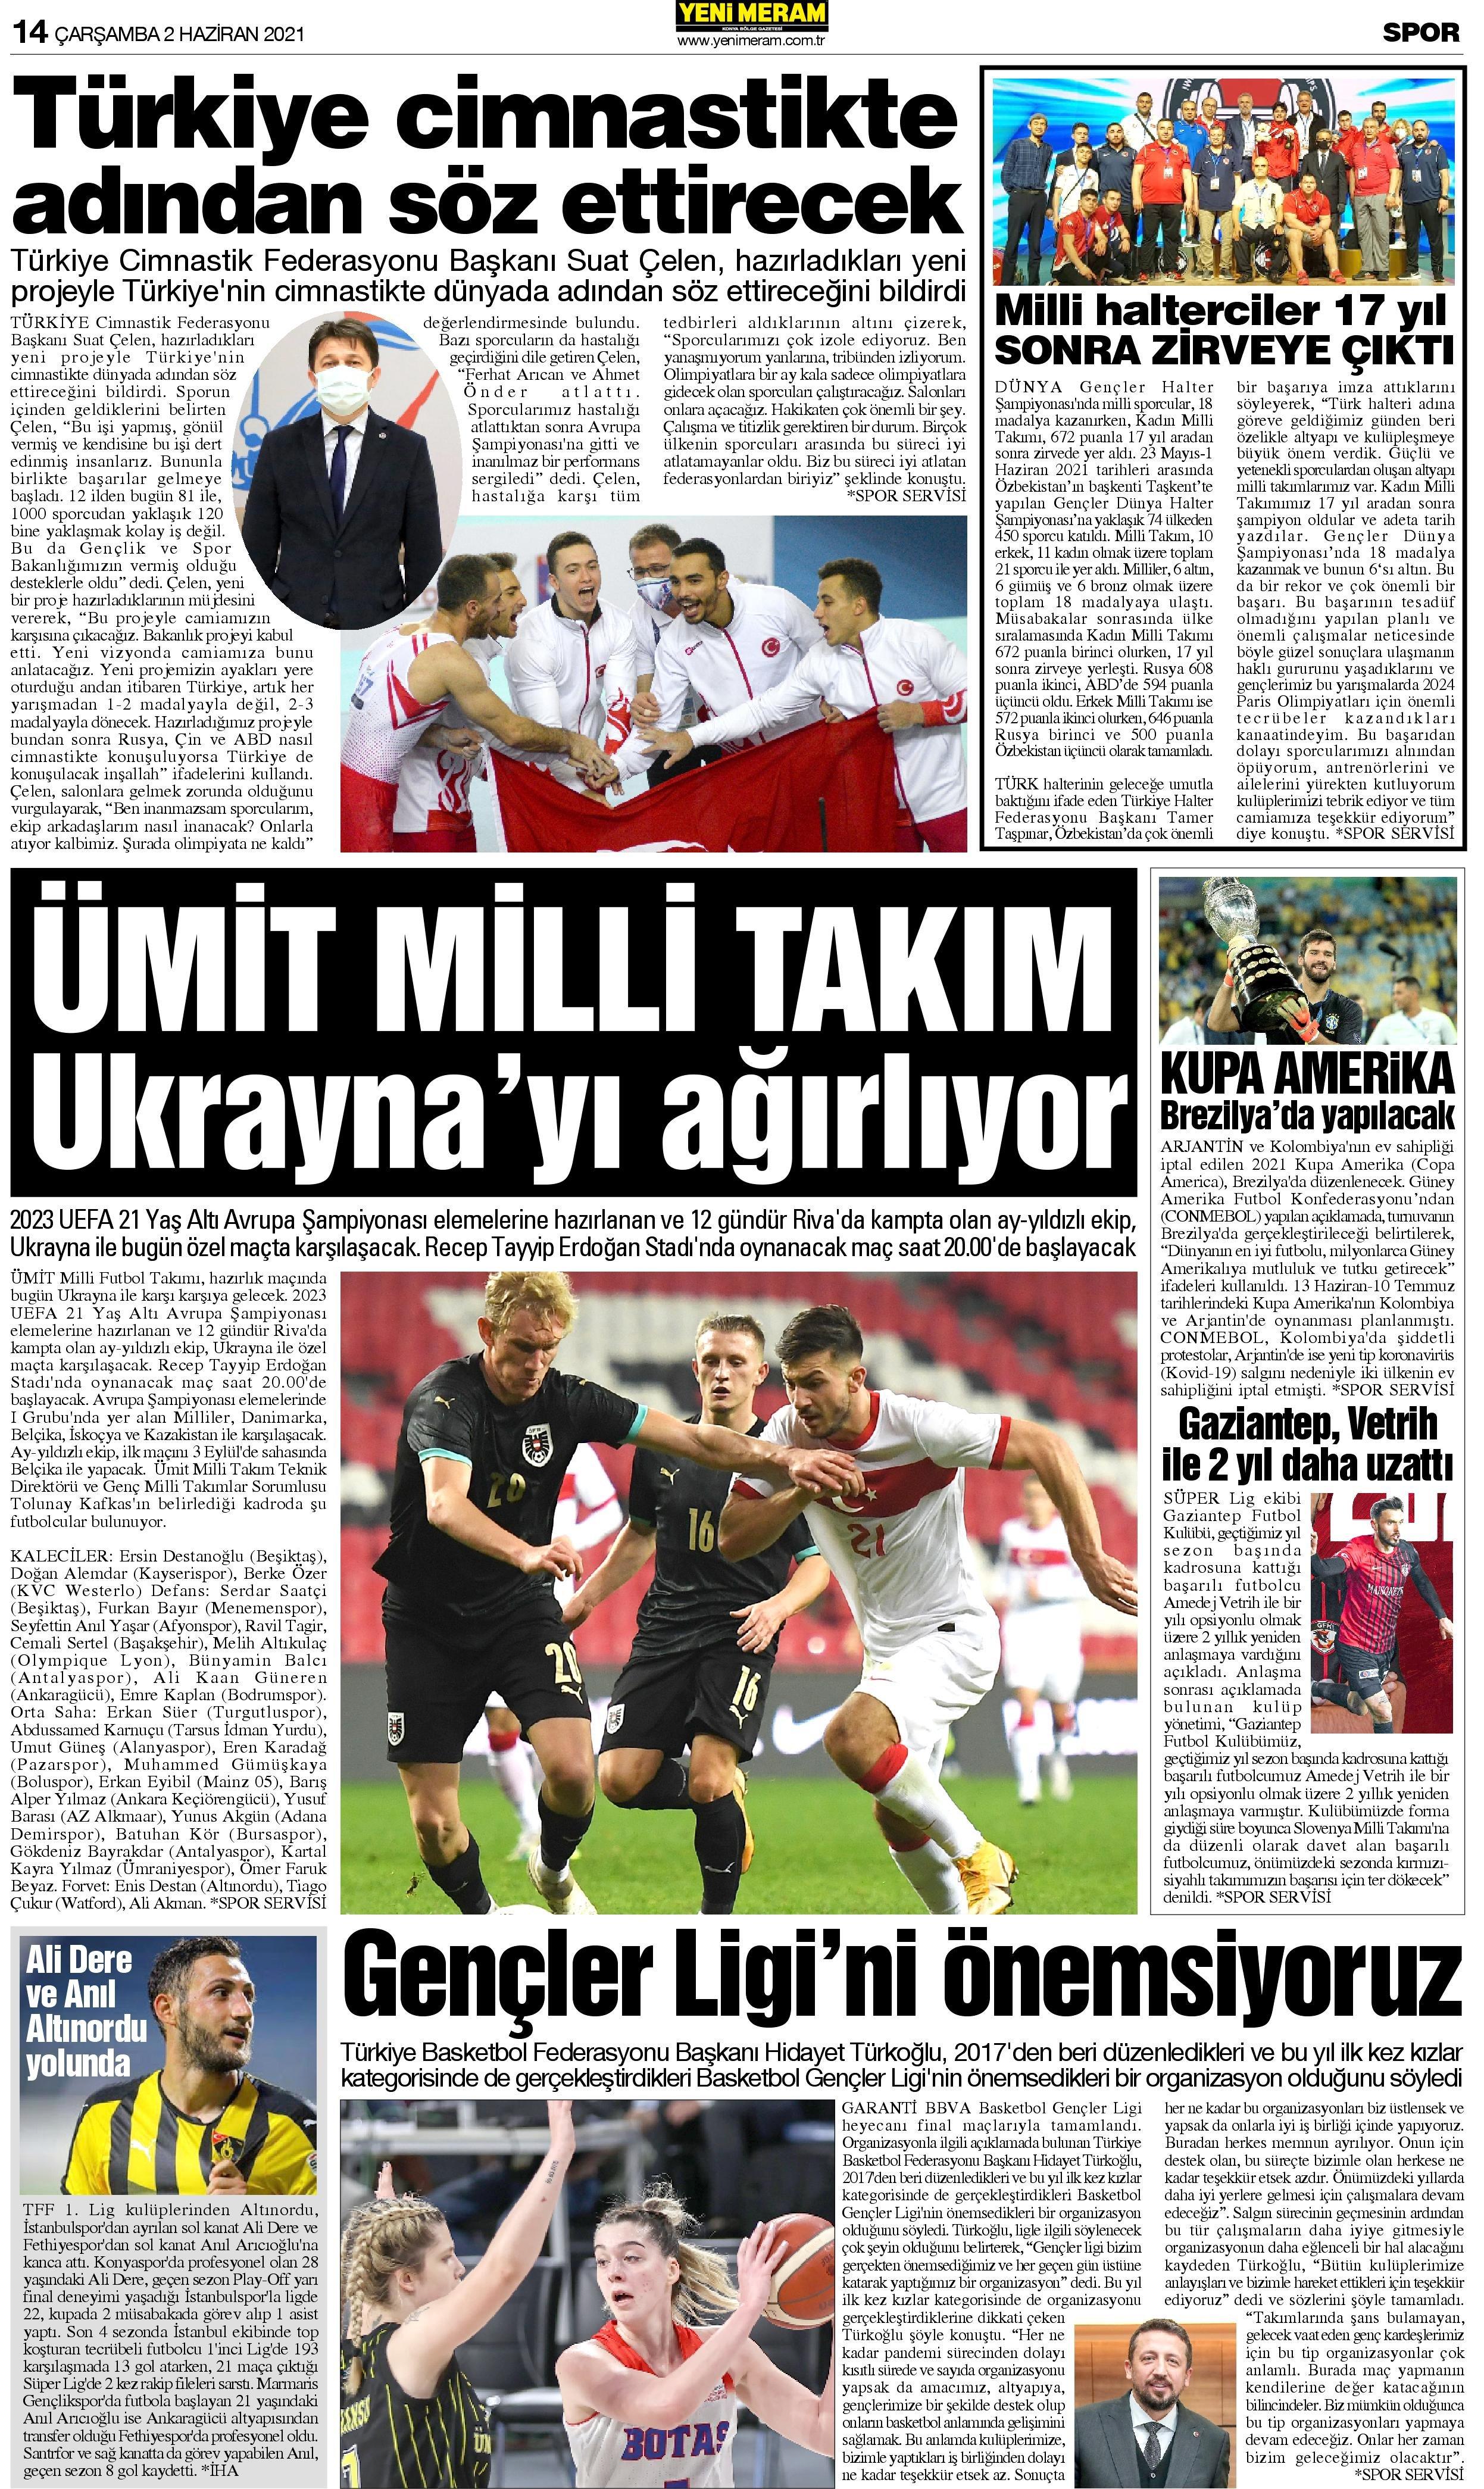 2 Haziran 2021 Yeni Meram Gazetesi